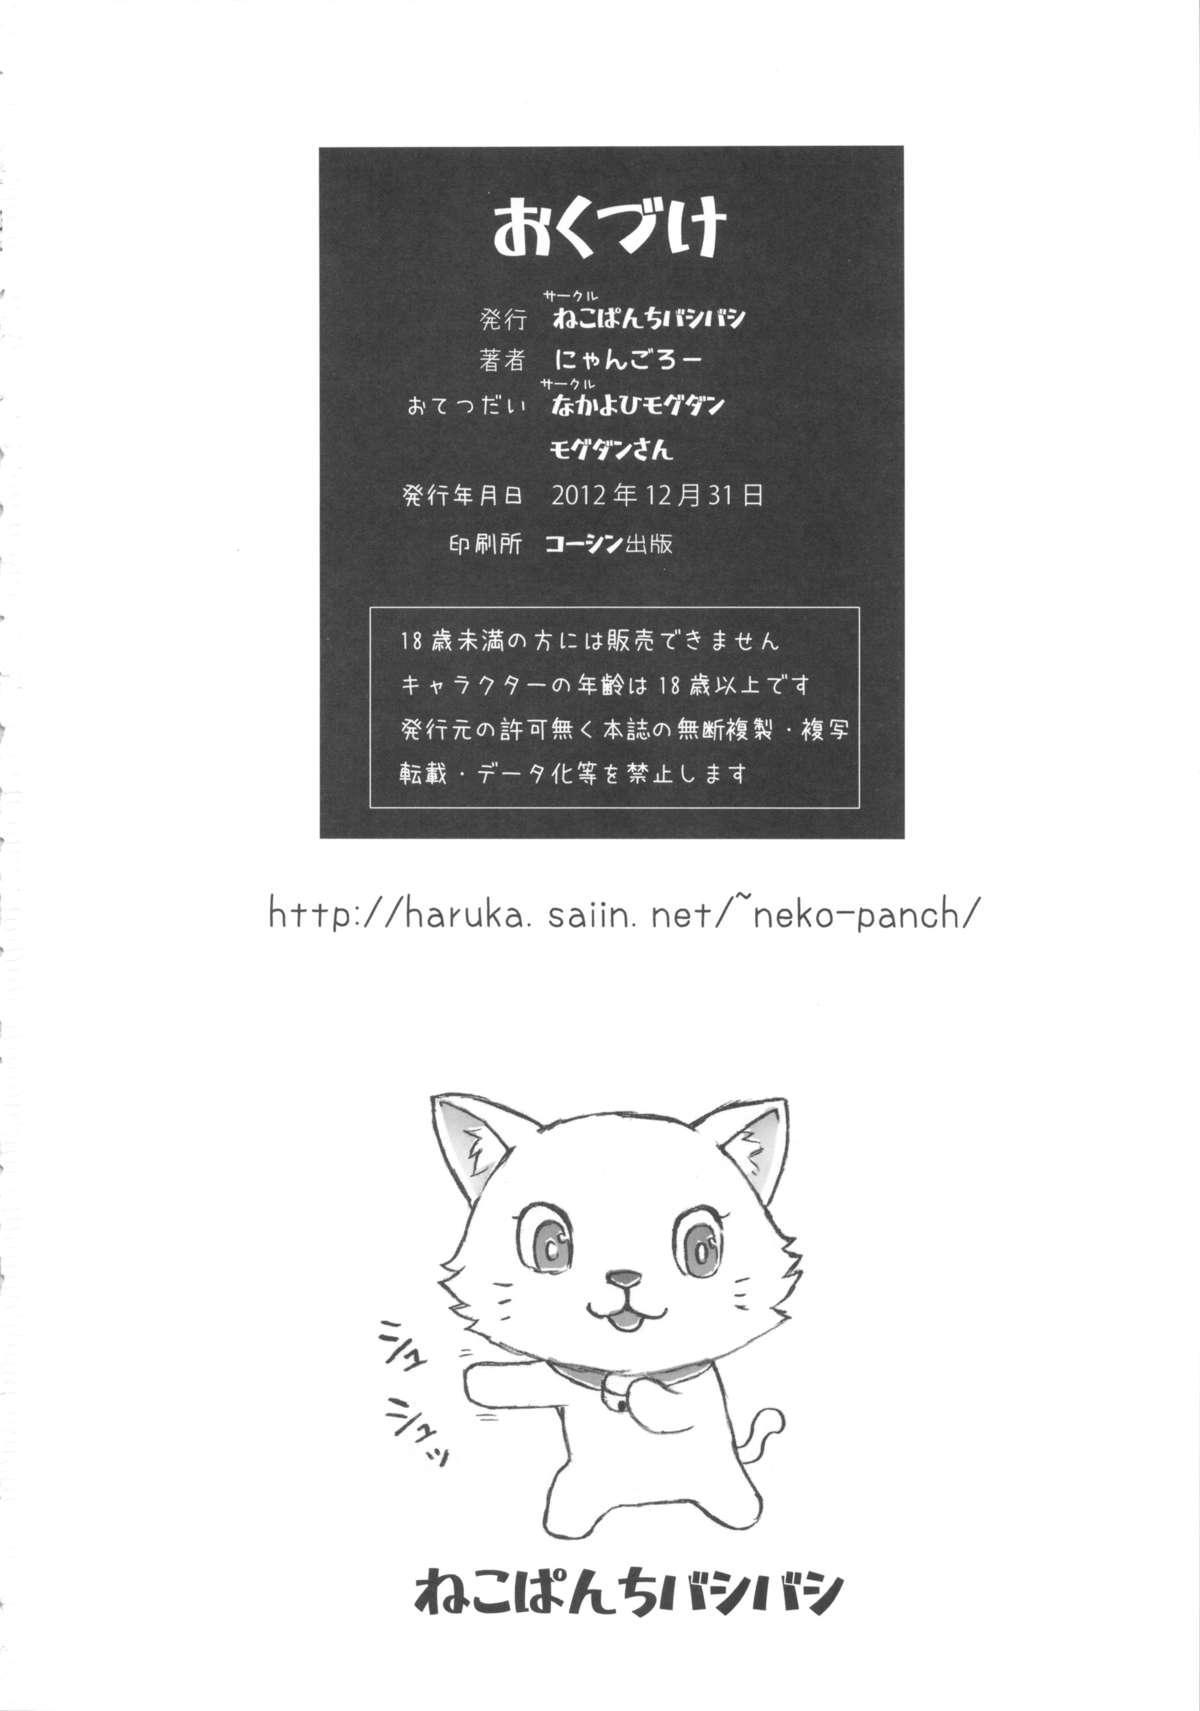 Inka + Omake Bon + Postcard 24